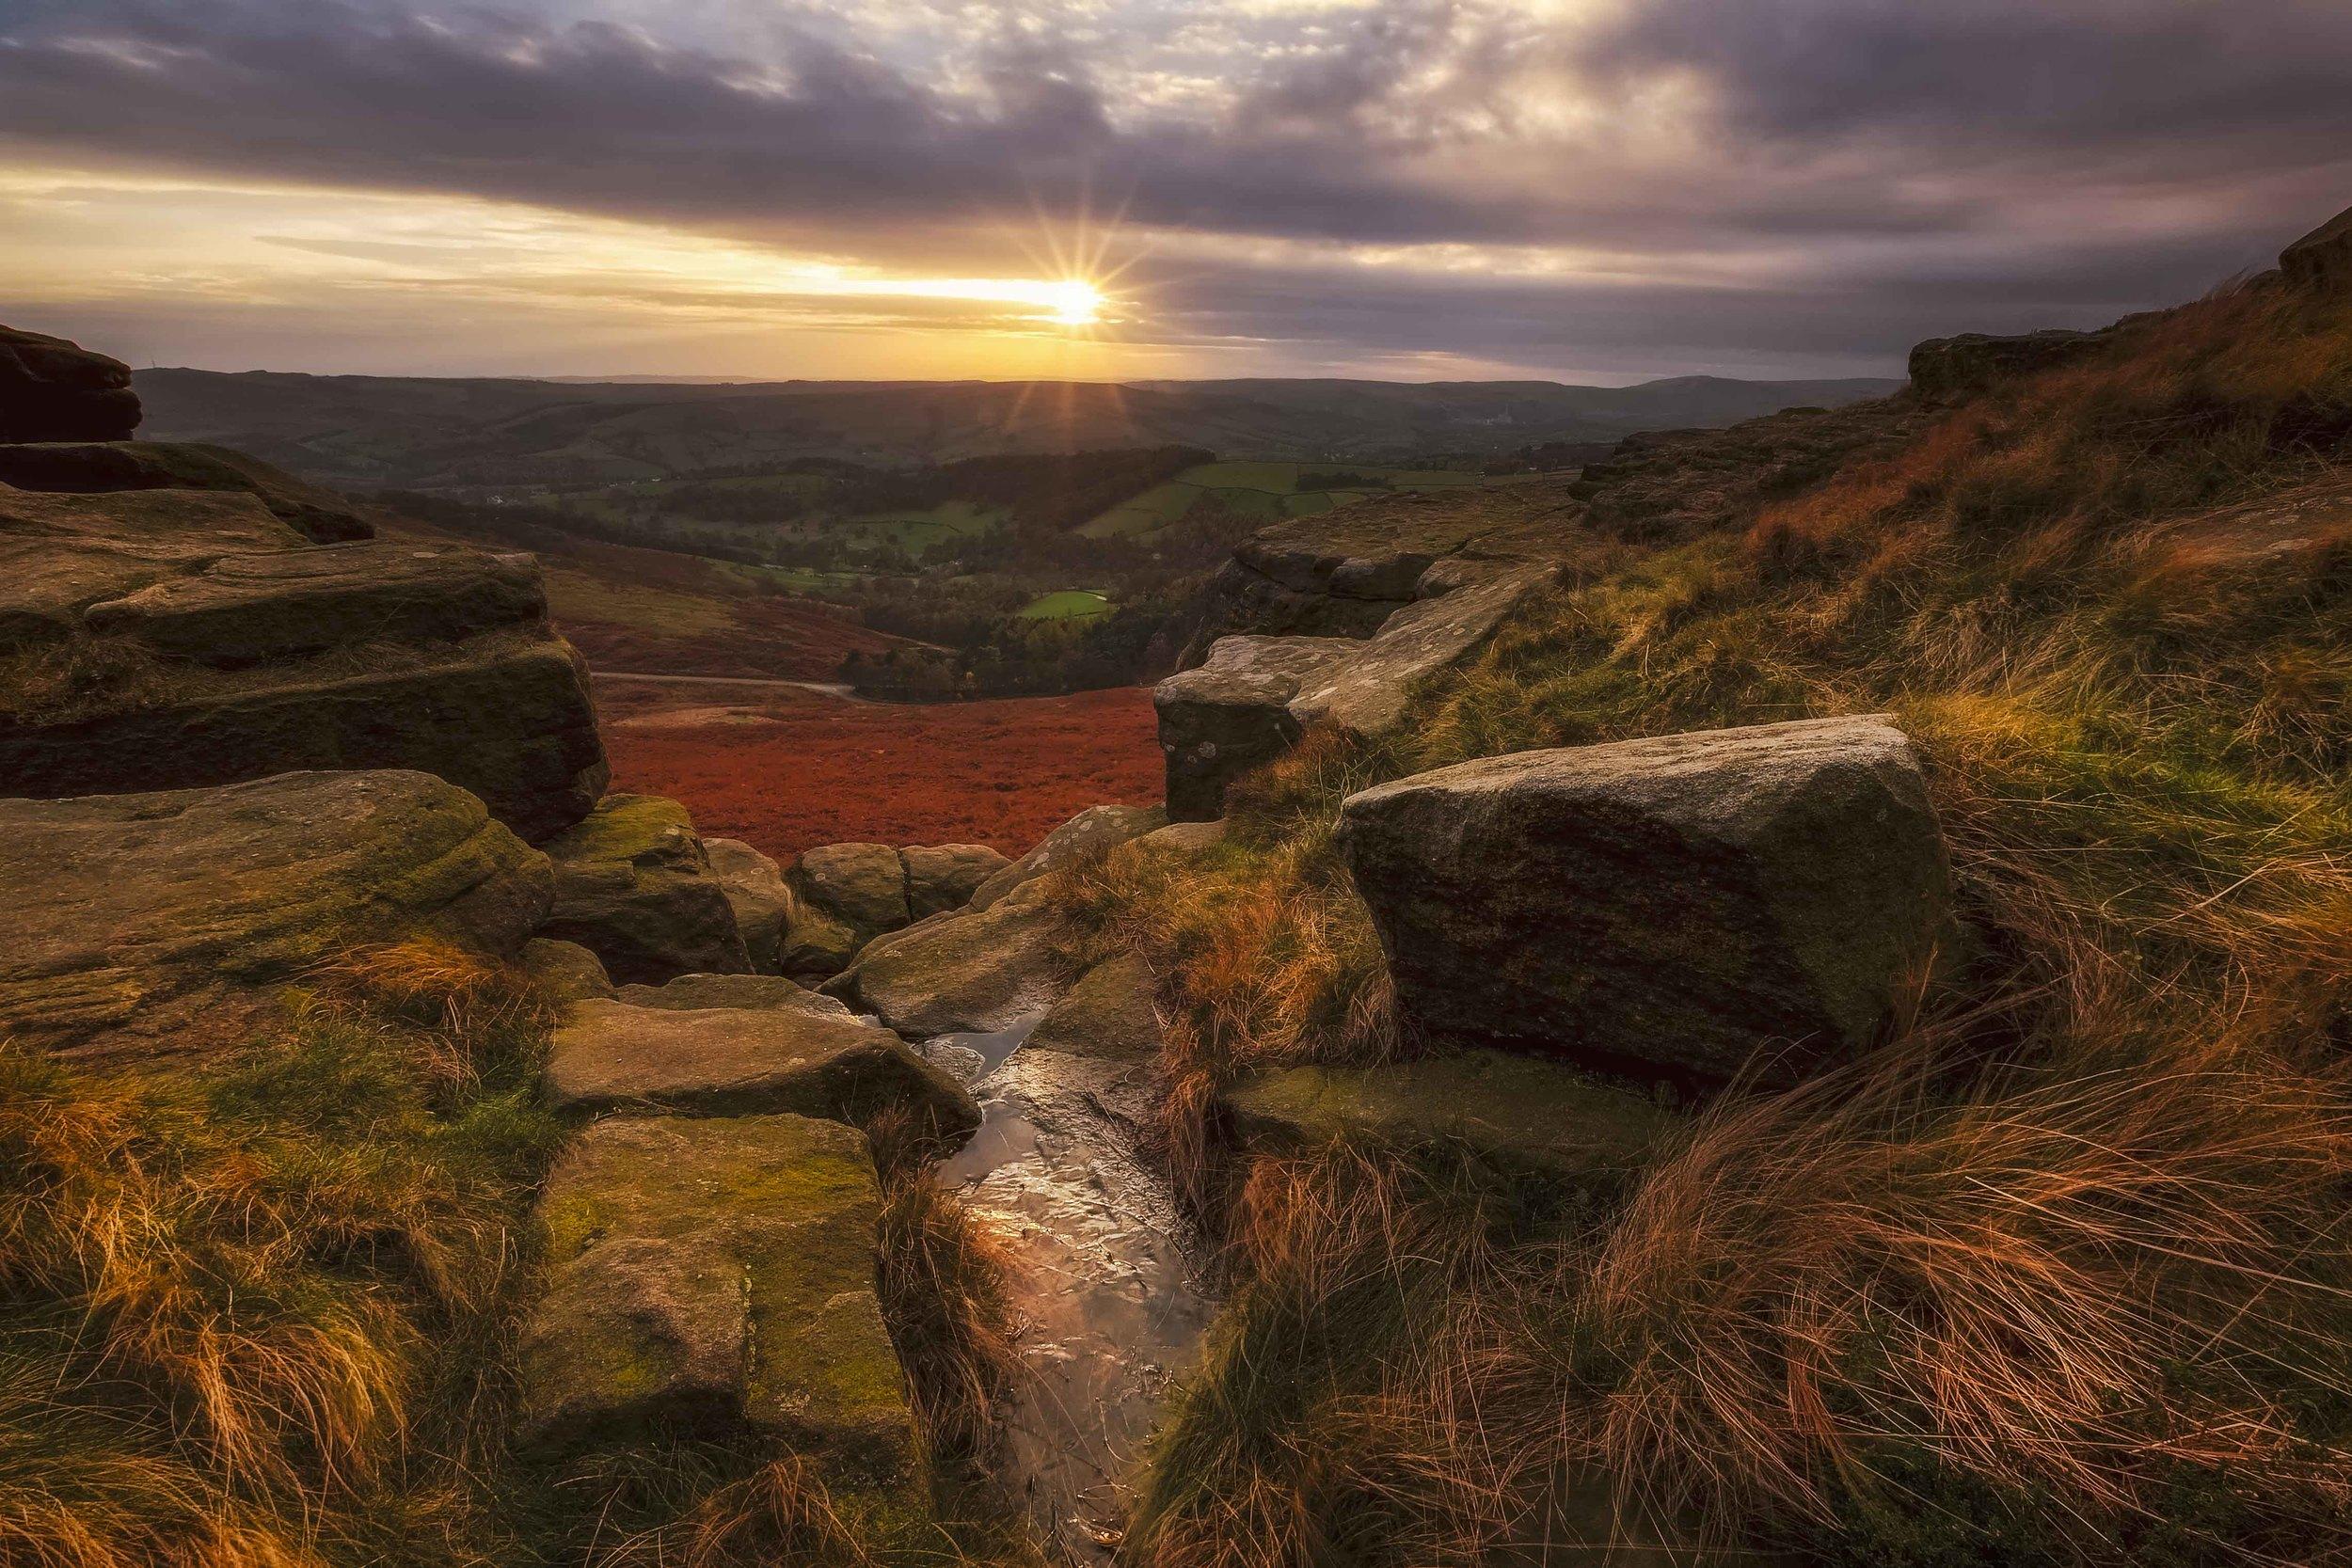 """Rugged Edge"" - Stanage Edge, Peak District, England Fujifilm X-T1 + 10-24mm f/4 OIS @ f/22. 1/3."